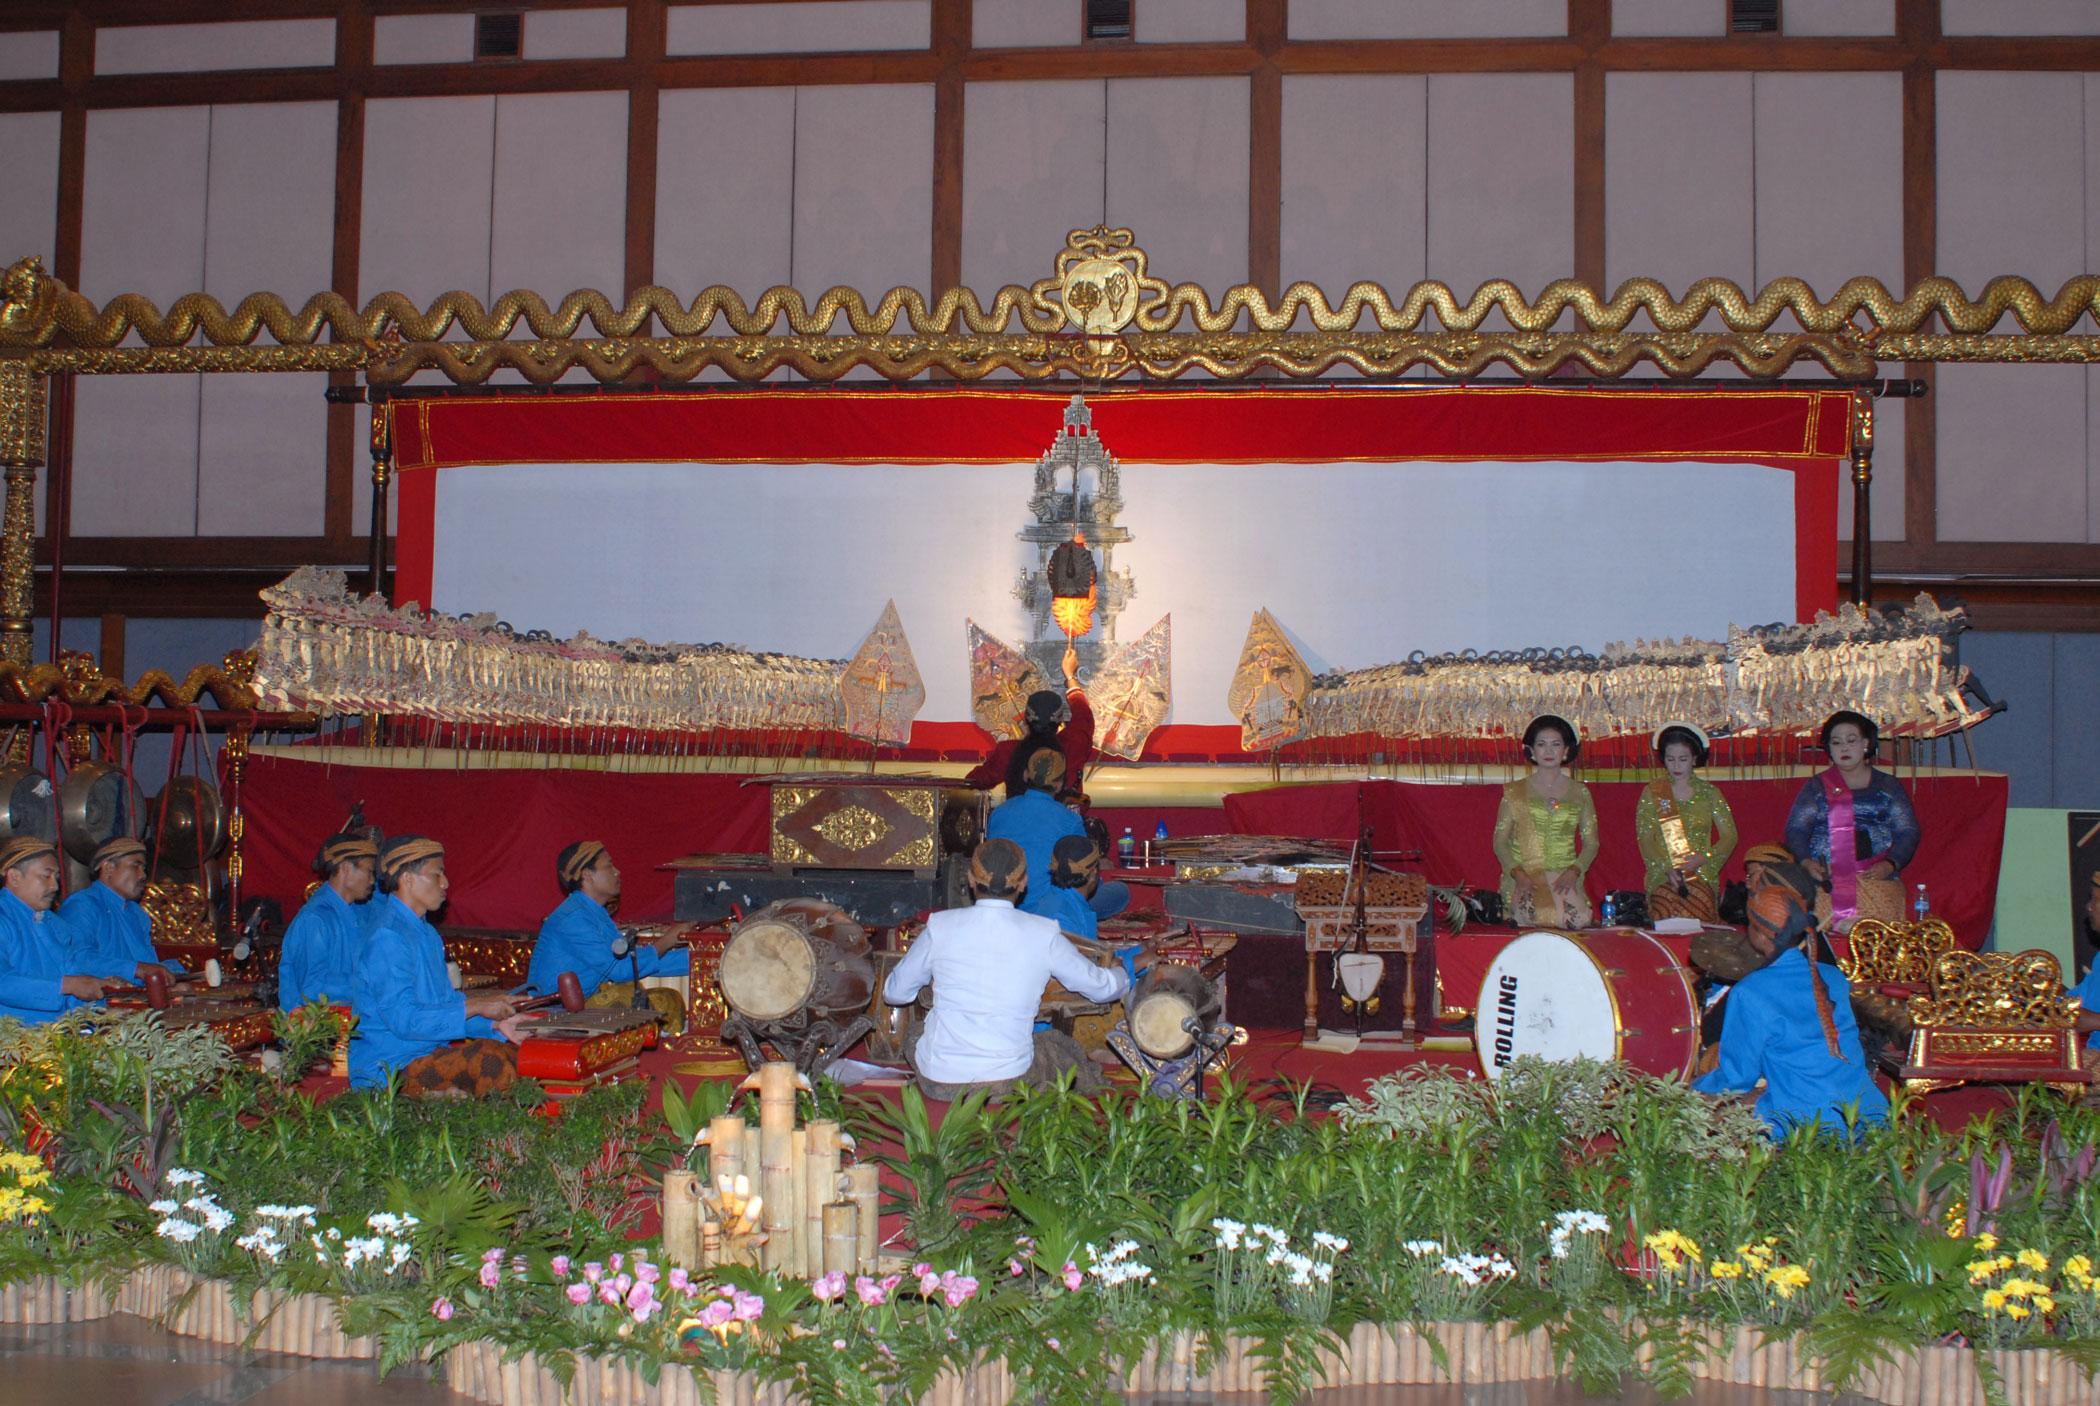 Un <em>dalang</em> javanais jouant avec l'orchestre gamelan et les chanteurs (<em>pesinden</em>). Théâtre d'ombres, <em>wayang <em>kulit</em> purwa</em> Surakarta (Java central, Indonésie).